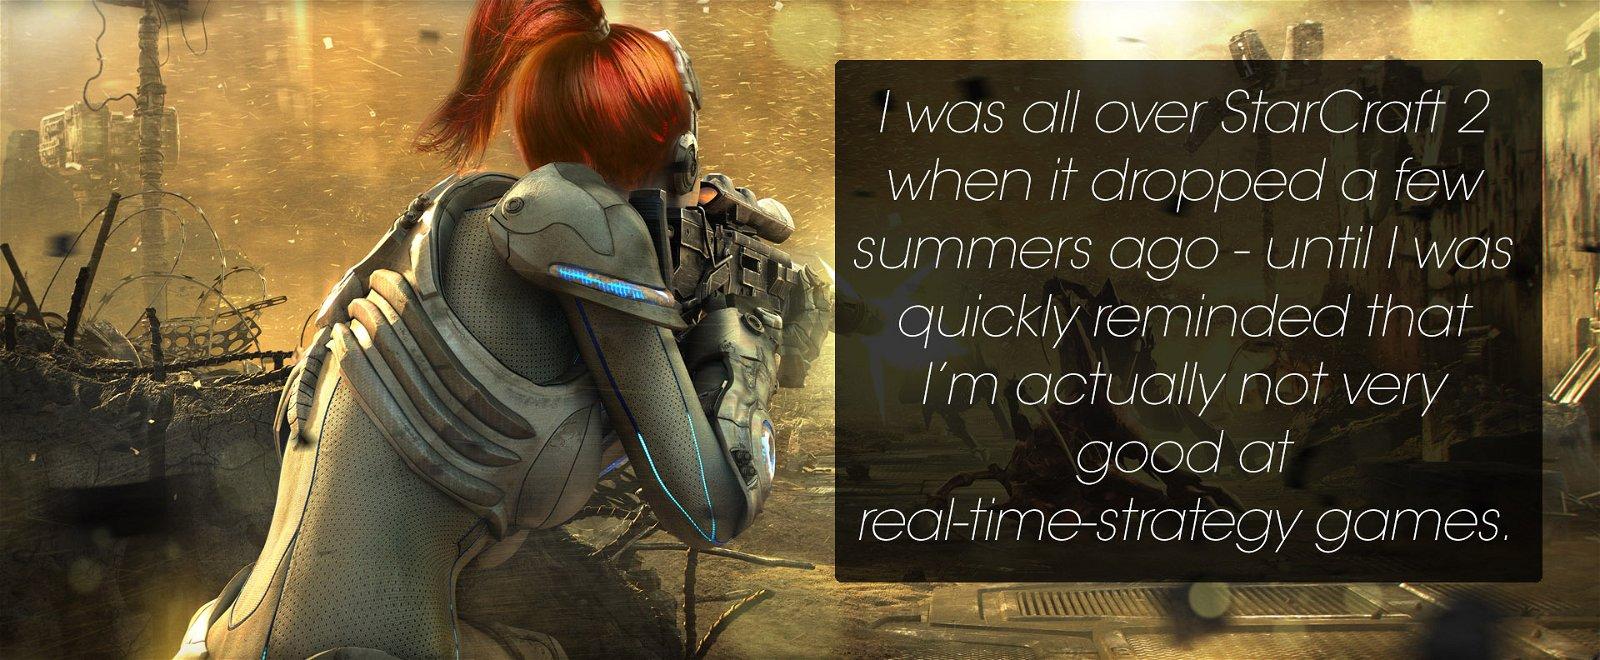 Starcraft_Middle_Top_Image.jpg